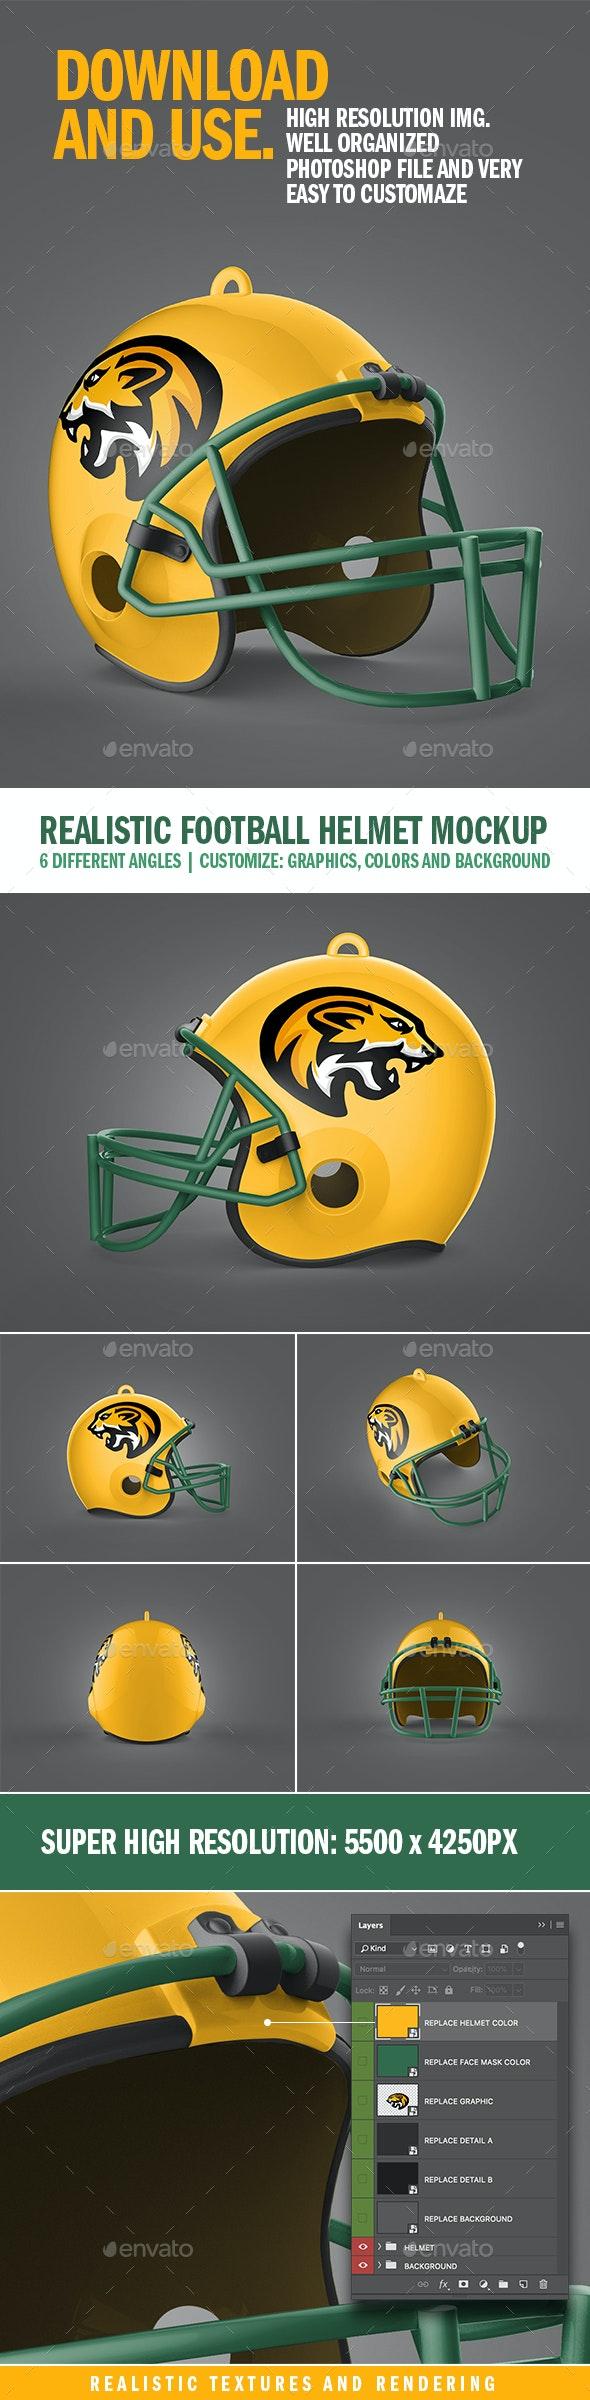 Realistic Football Helmet Mockup - Product Mock-Ups Graphics